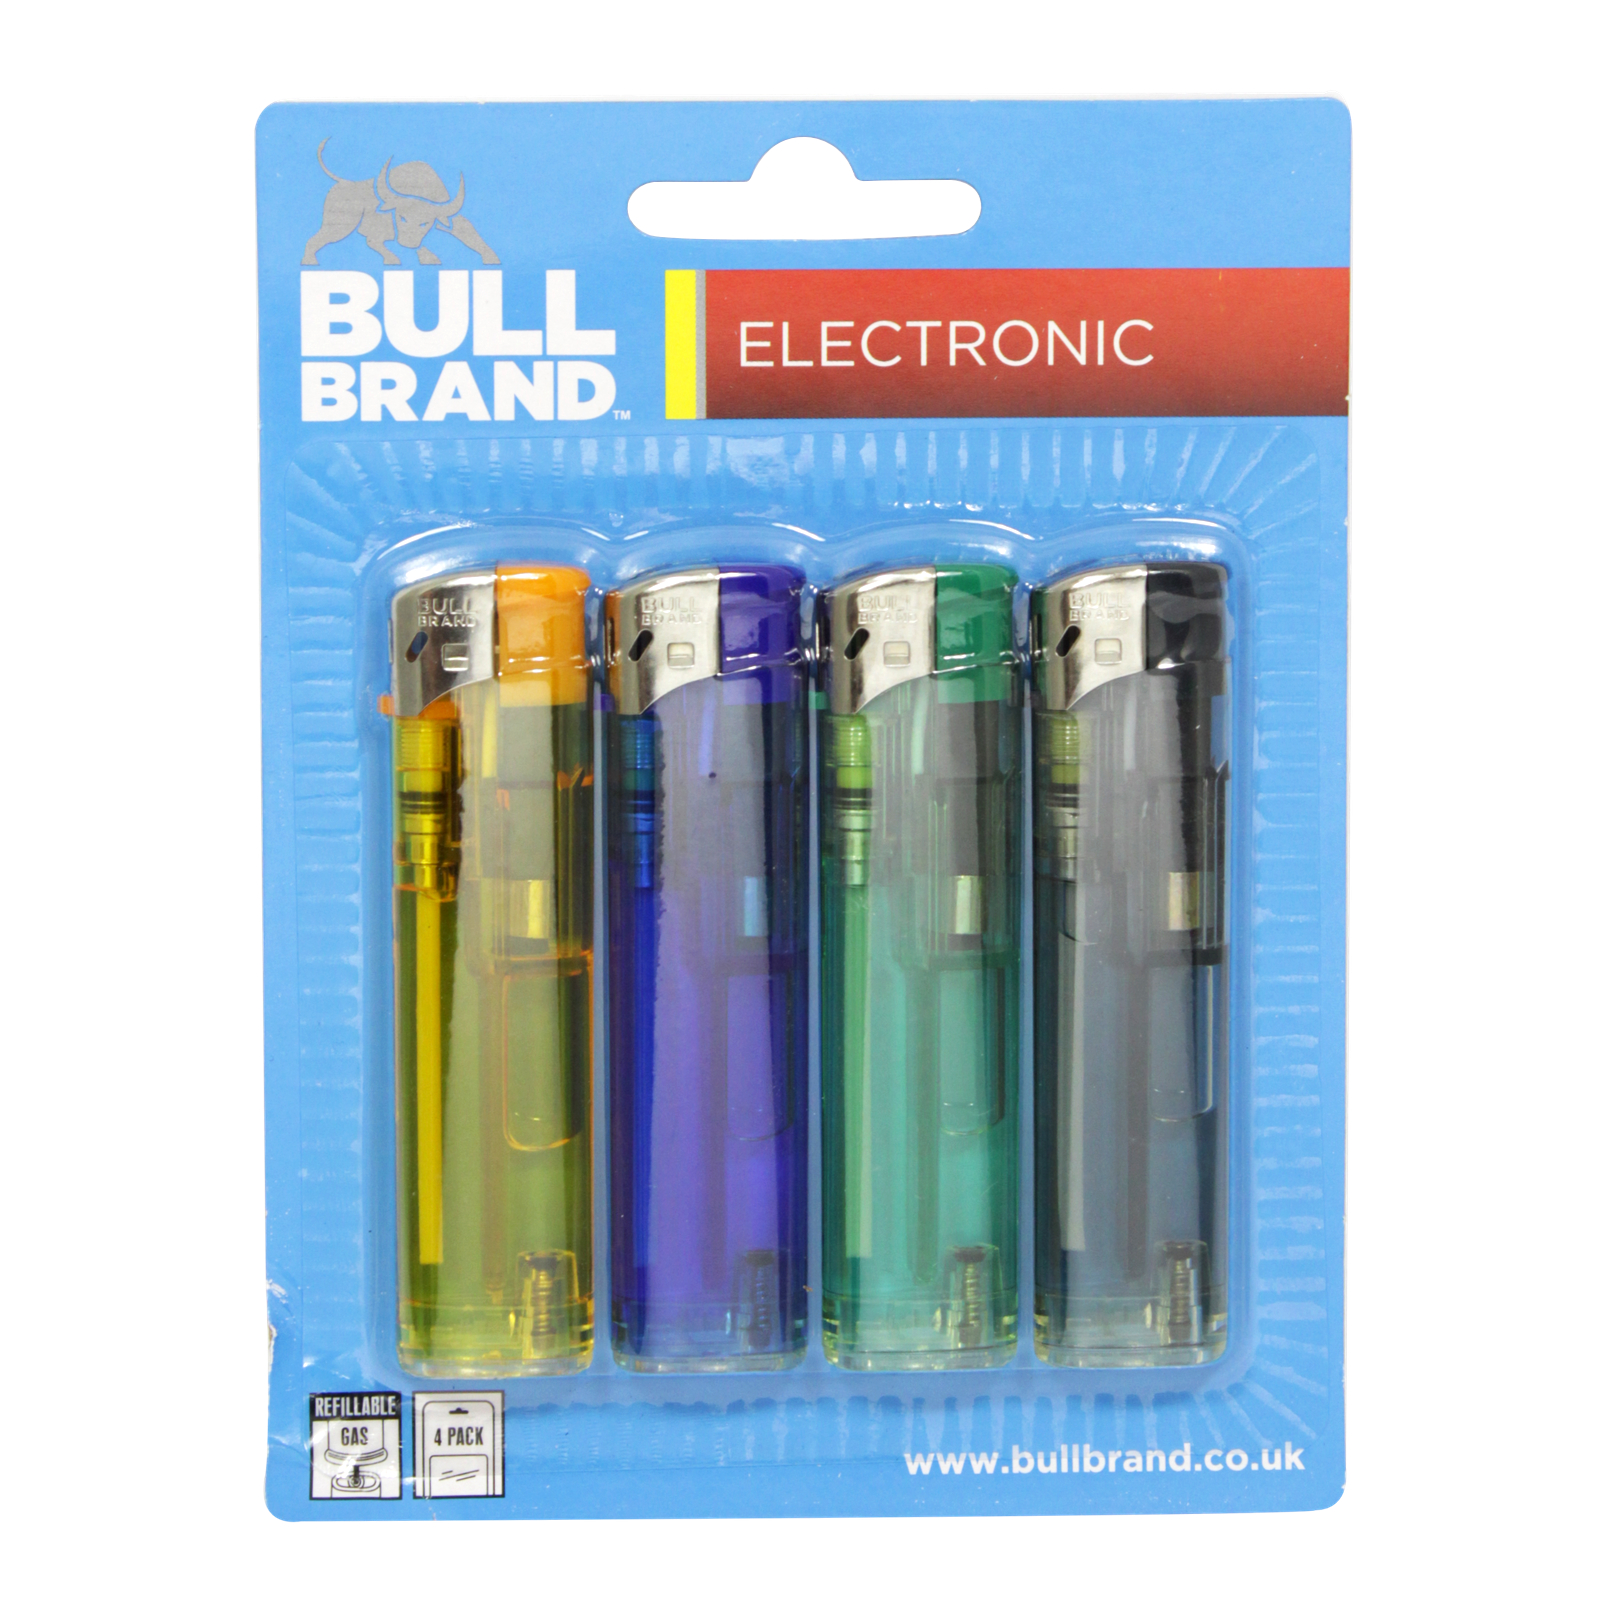 BULLBRAND 4PK ELECTRONIC LIGHTERS